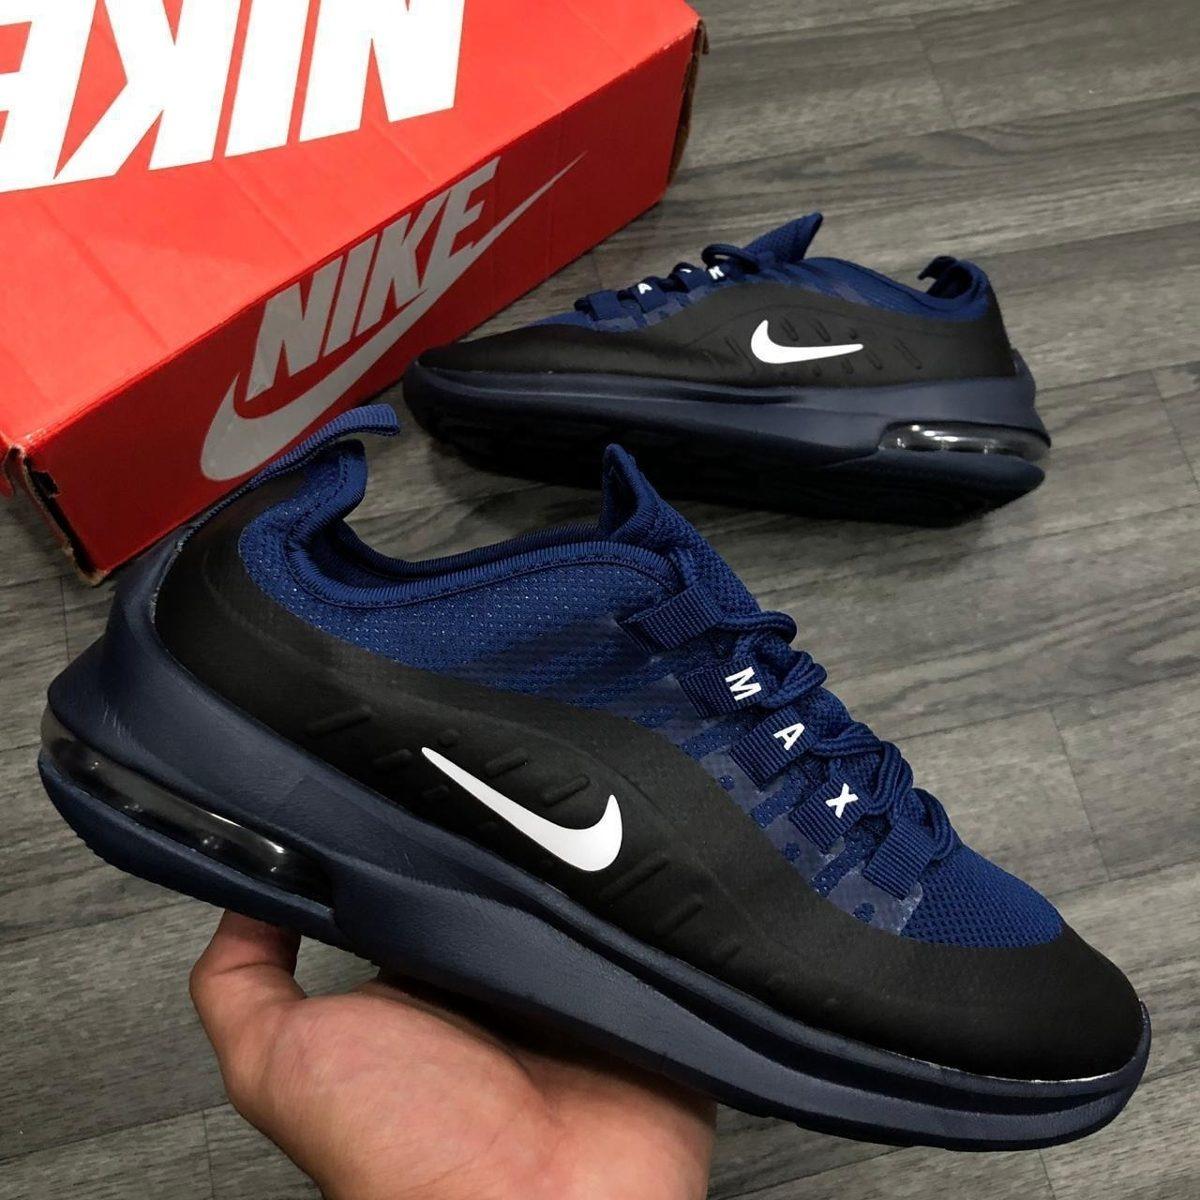 Tenis Hombre Nike Air Max Vapormax Plus Zapatos Sport Caja